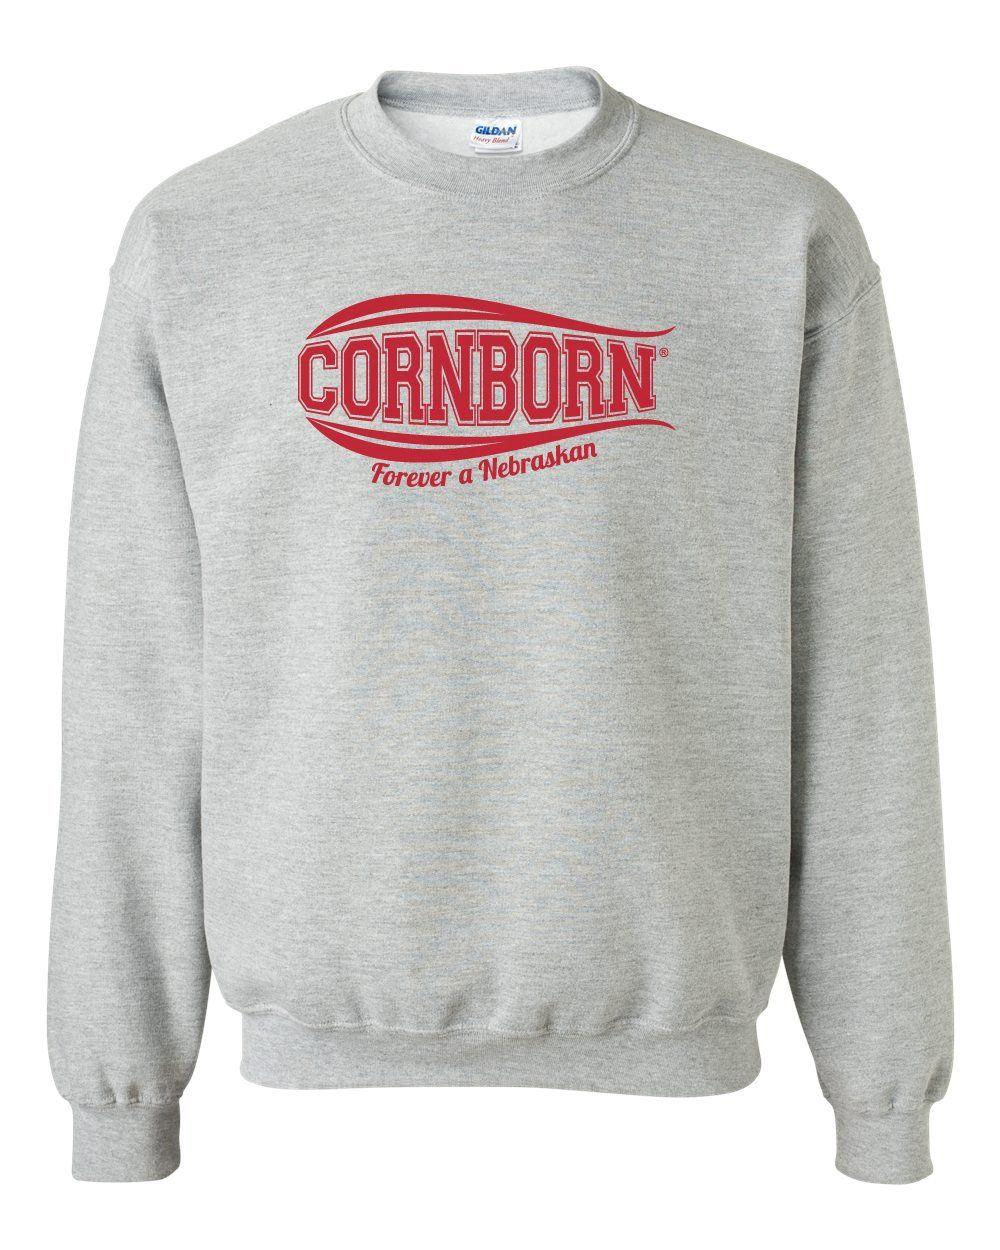 05715e5f Nebraska Crewneck Sweatshirt - CORNBORN - Forever a Nebraskan ...